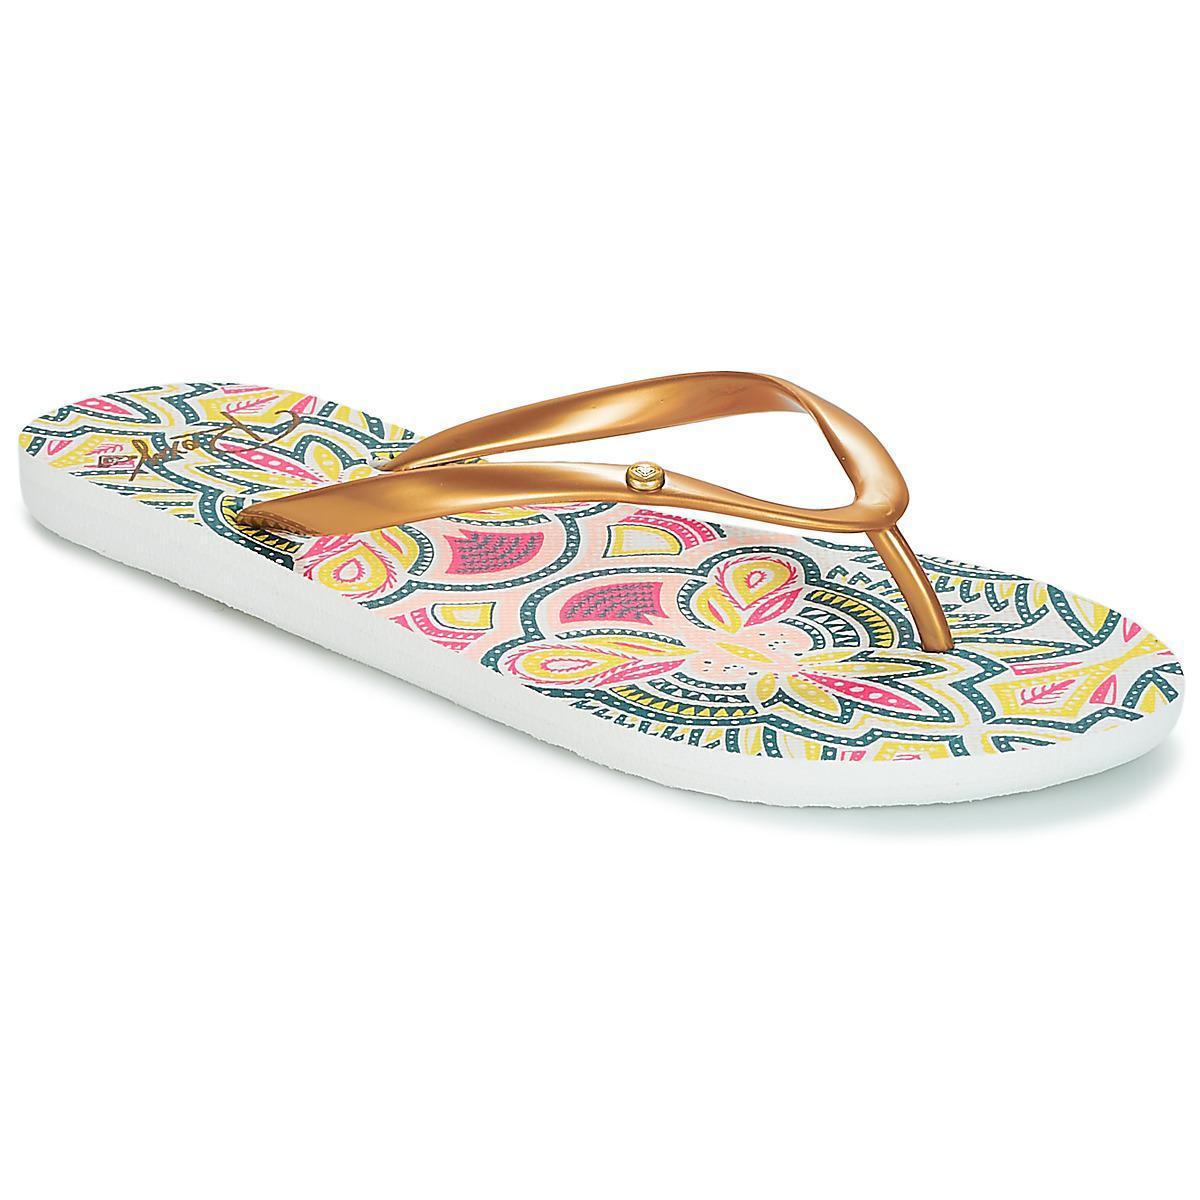 adf66f5fec25 Roxy Portofino Ii J Sndl Gcr Women s Flip Flops   Sandals (shoes) In ...